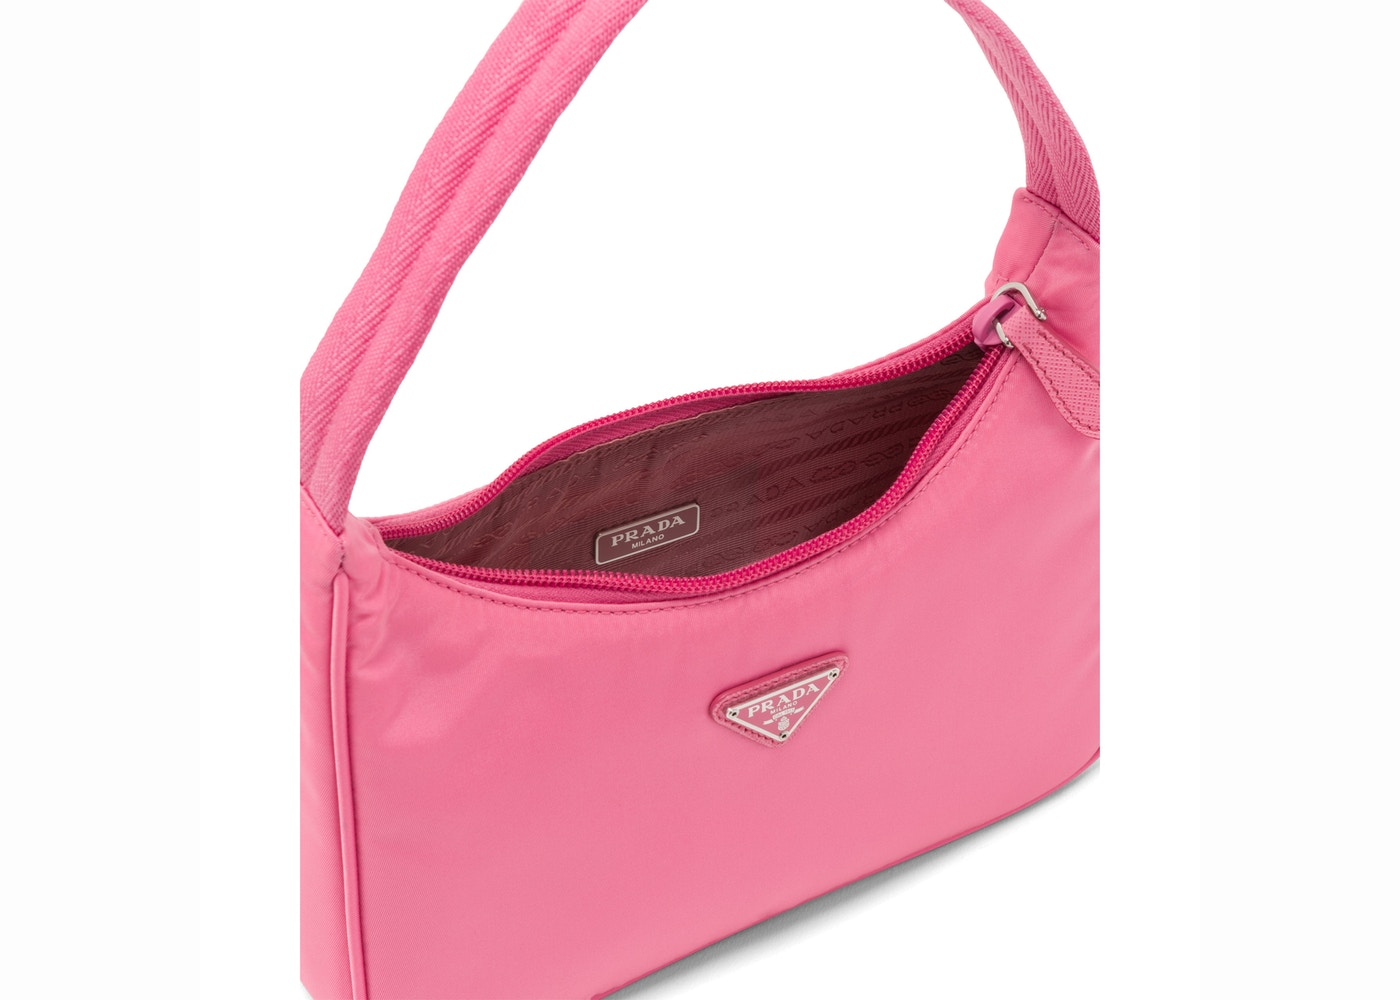 Prada Re Edition 2000 Mini Bag Nylon Pink